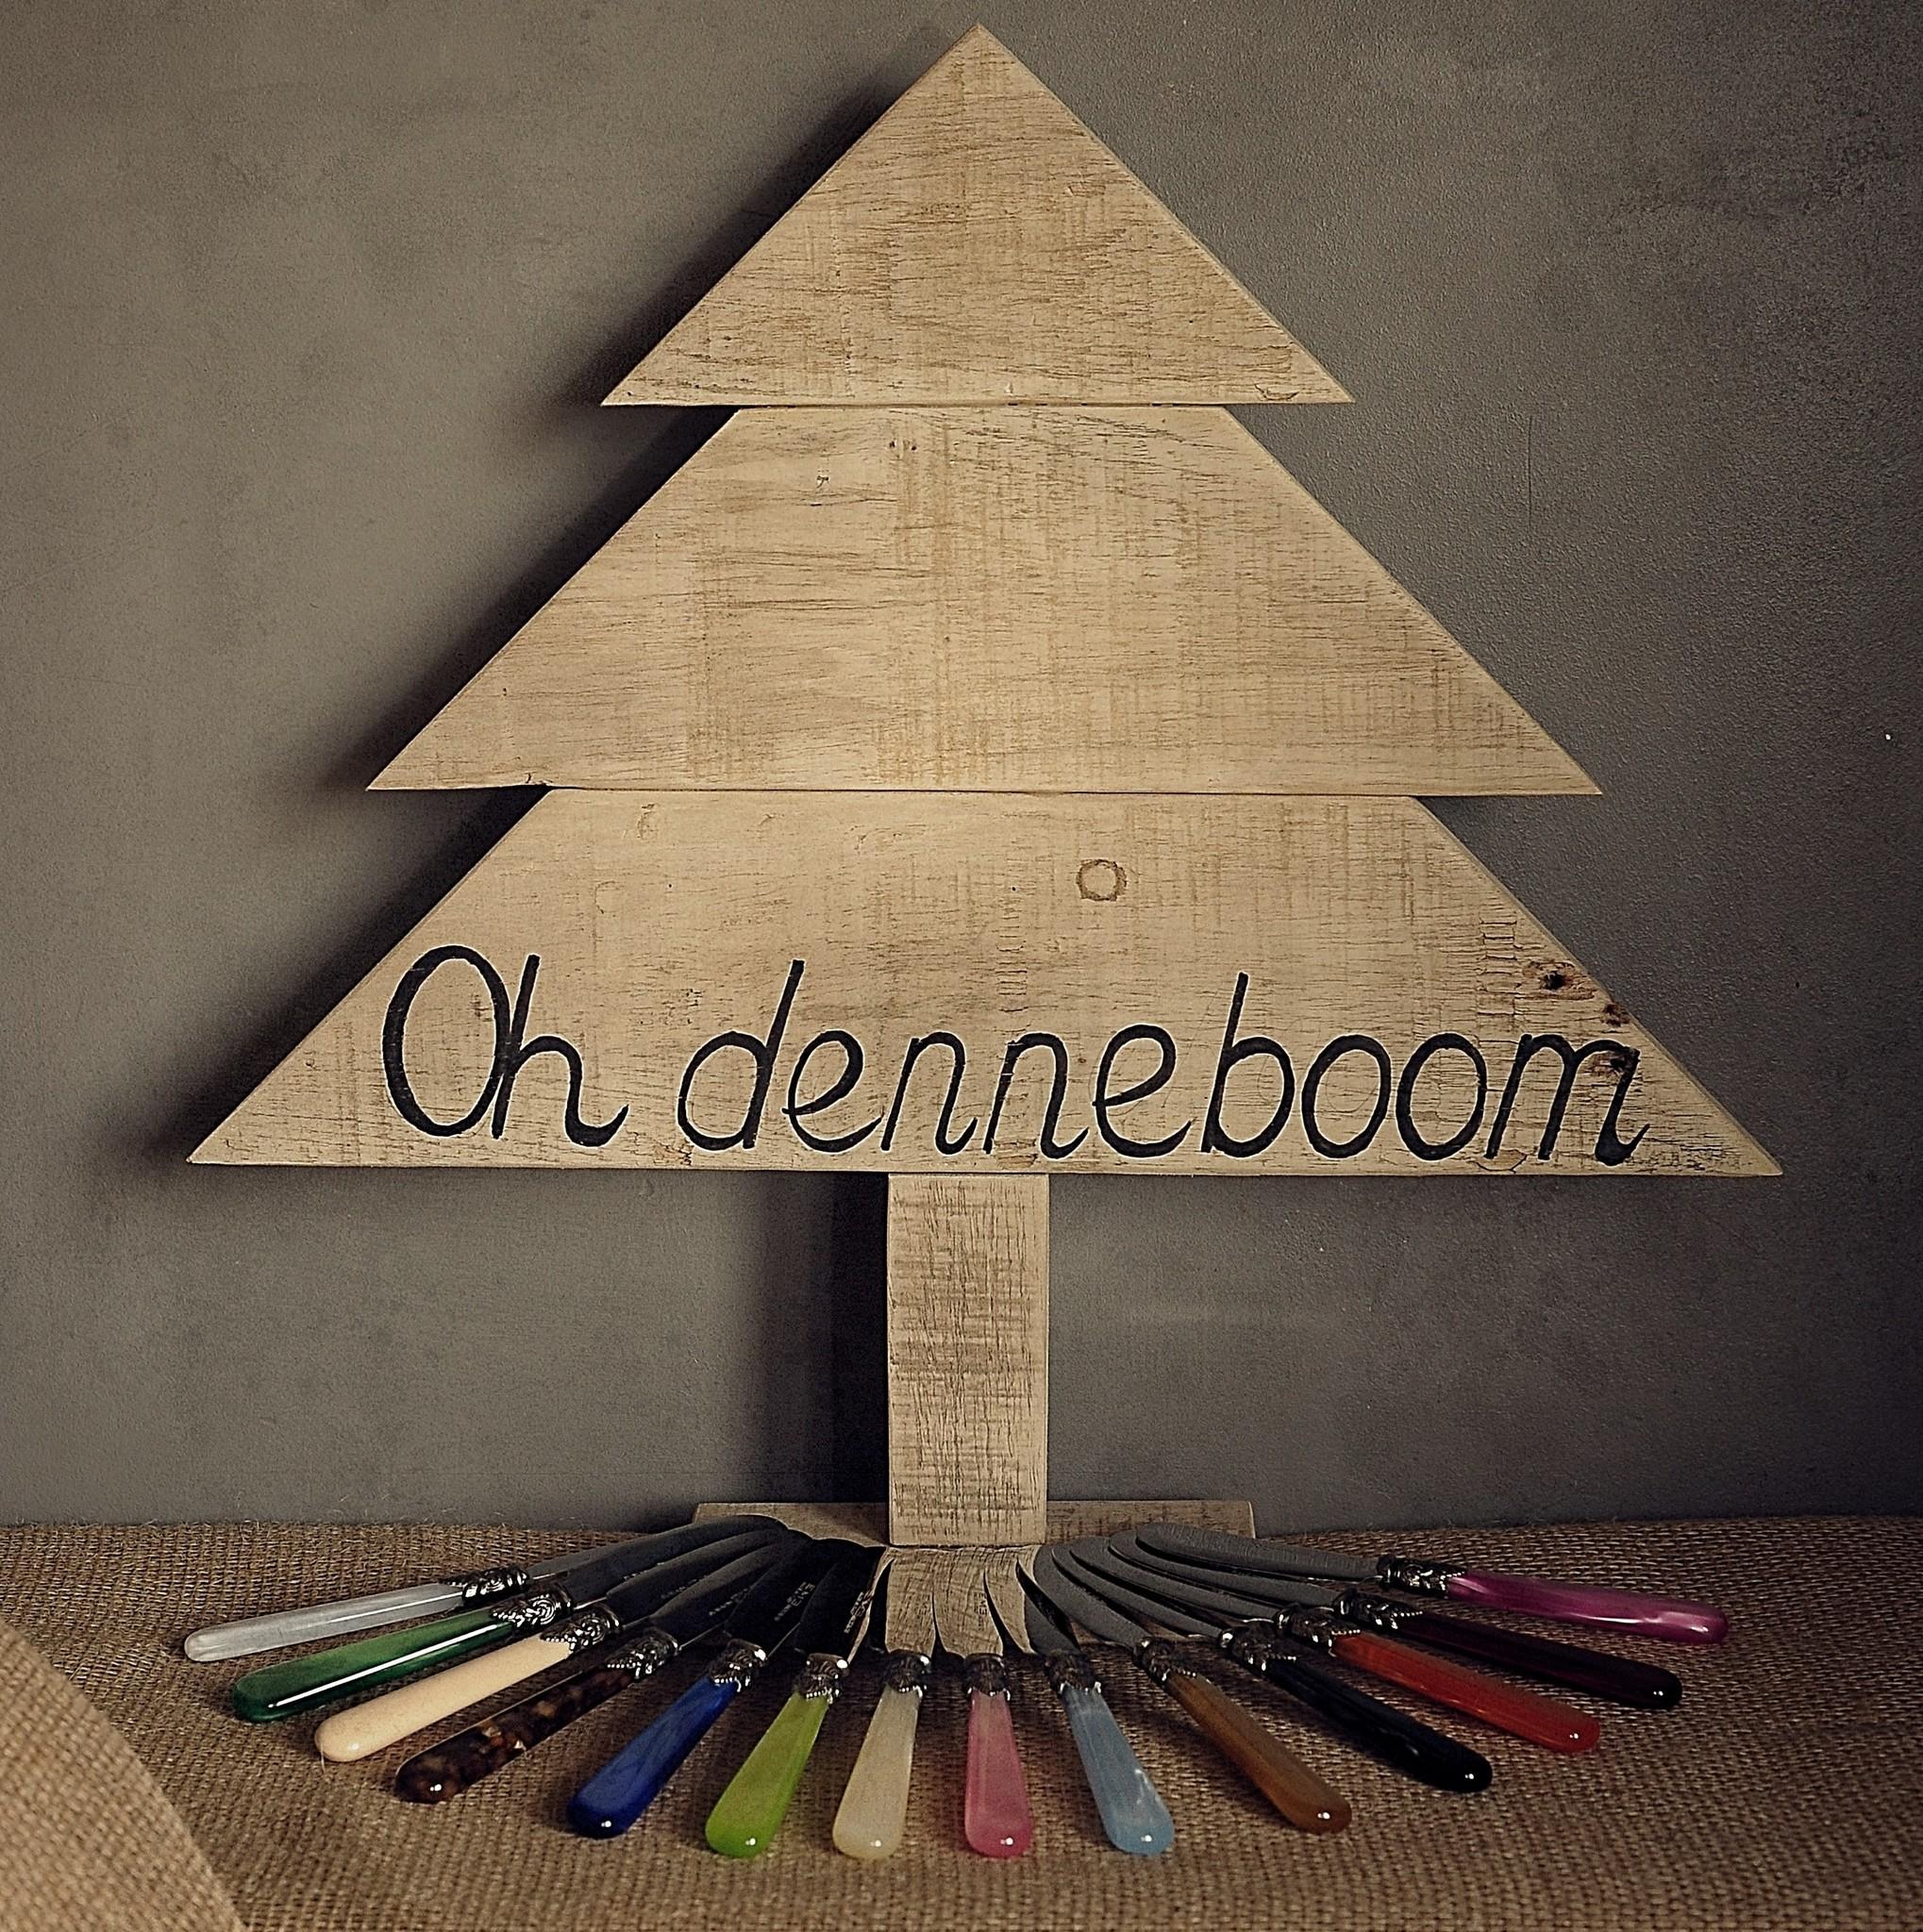 Sinterklaascadeau en Kerstcadeau: Top 5 cadeautips